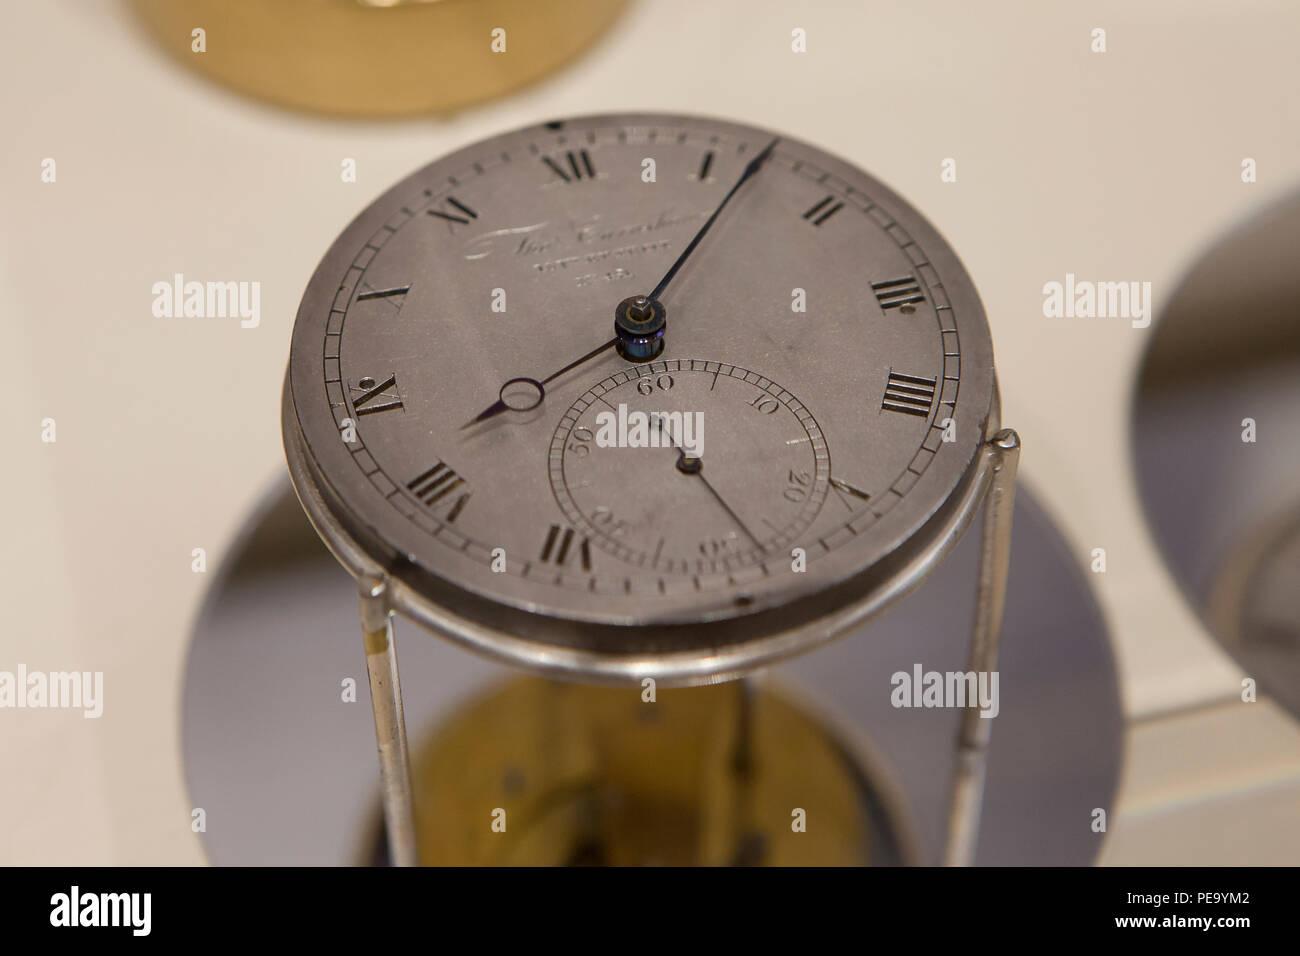 Marine chronometer movement (escapement), circa 1790s - Stock Image